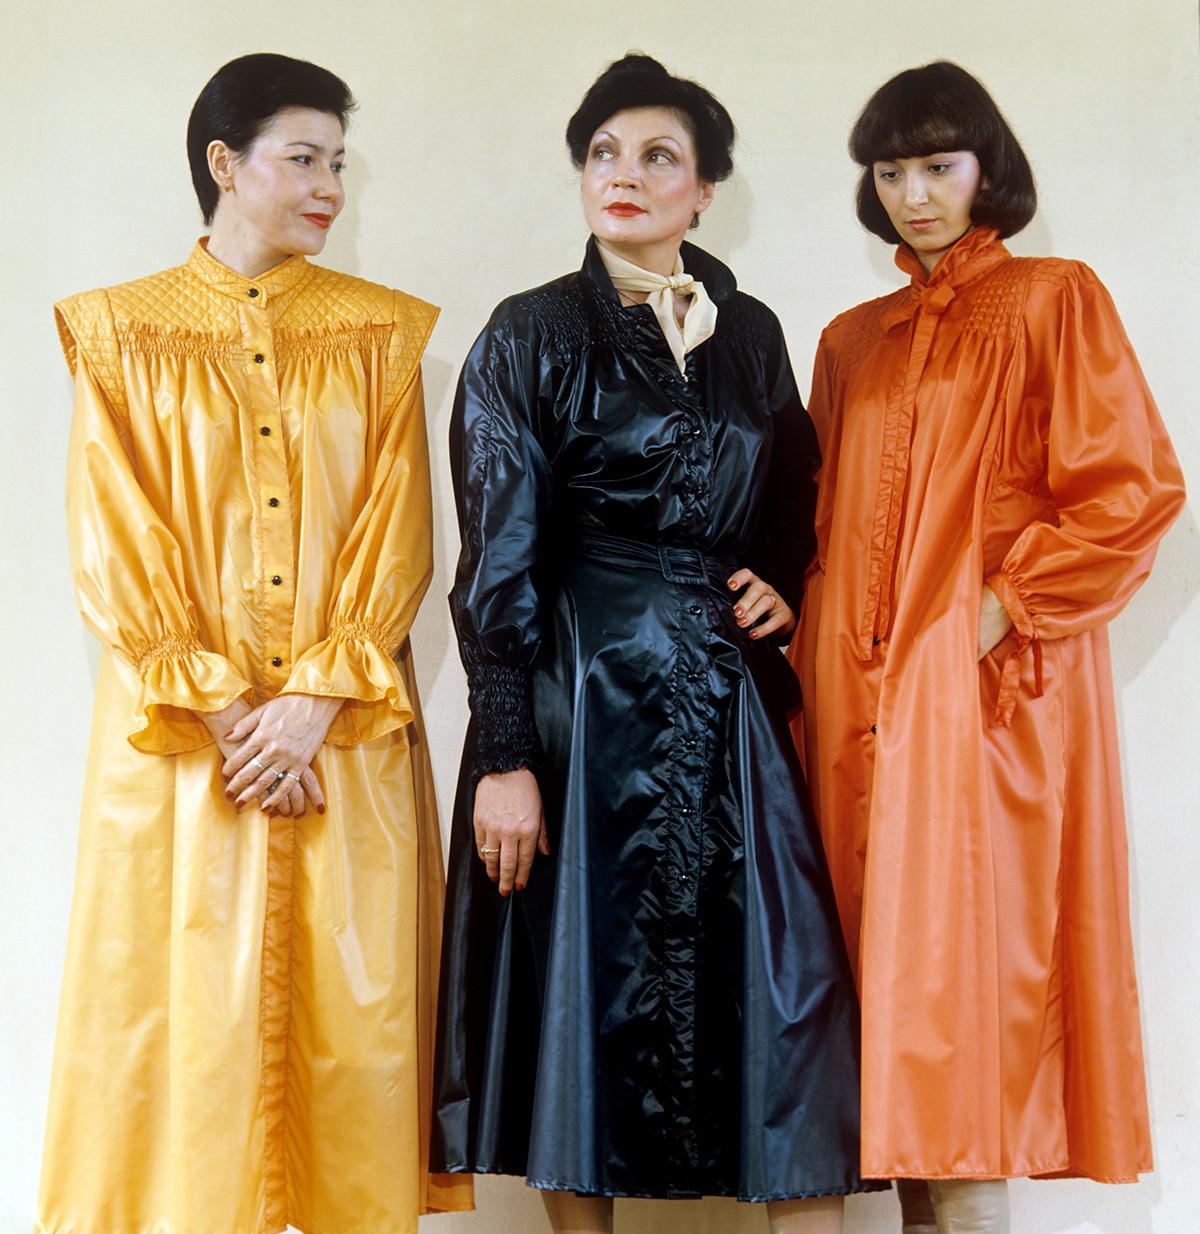 Modelos soviéticas, 1982.